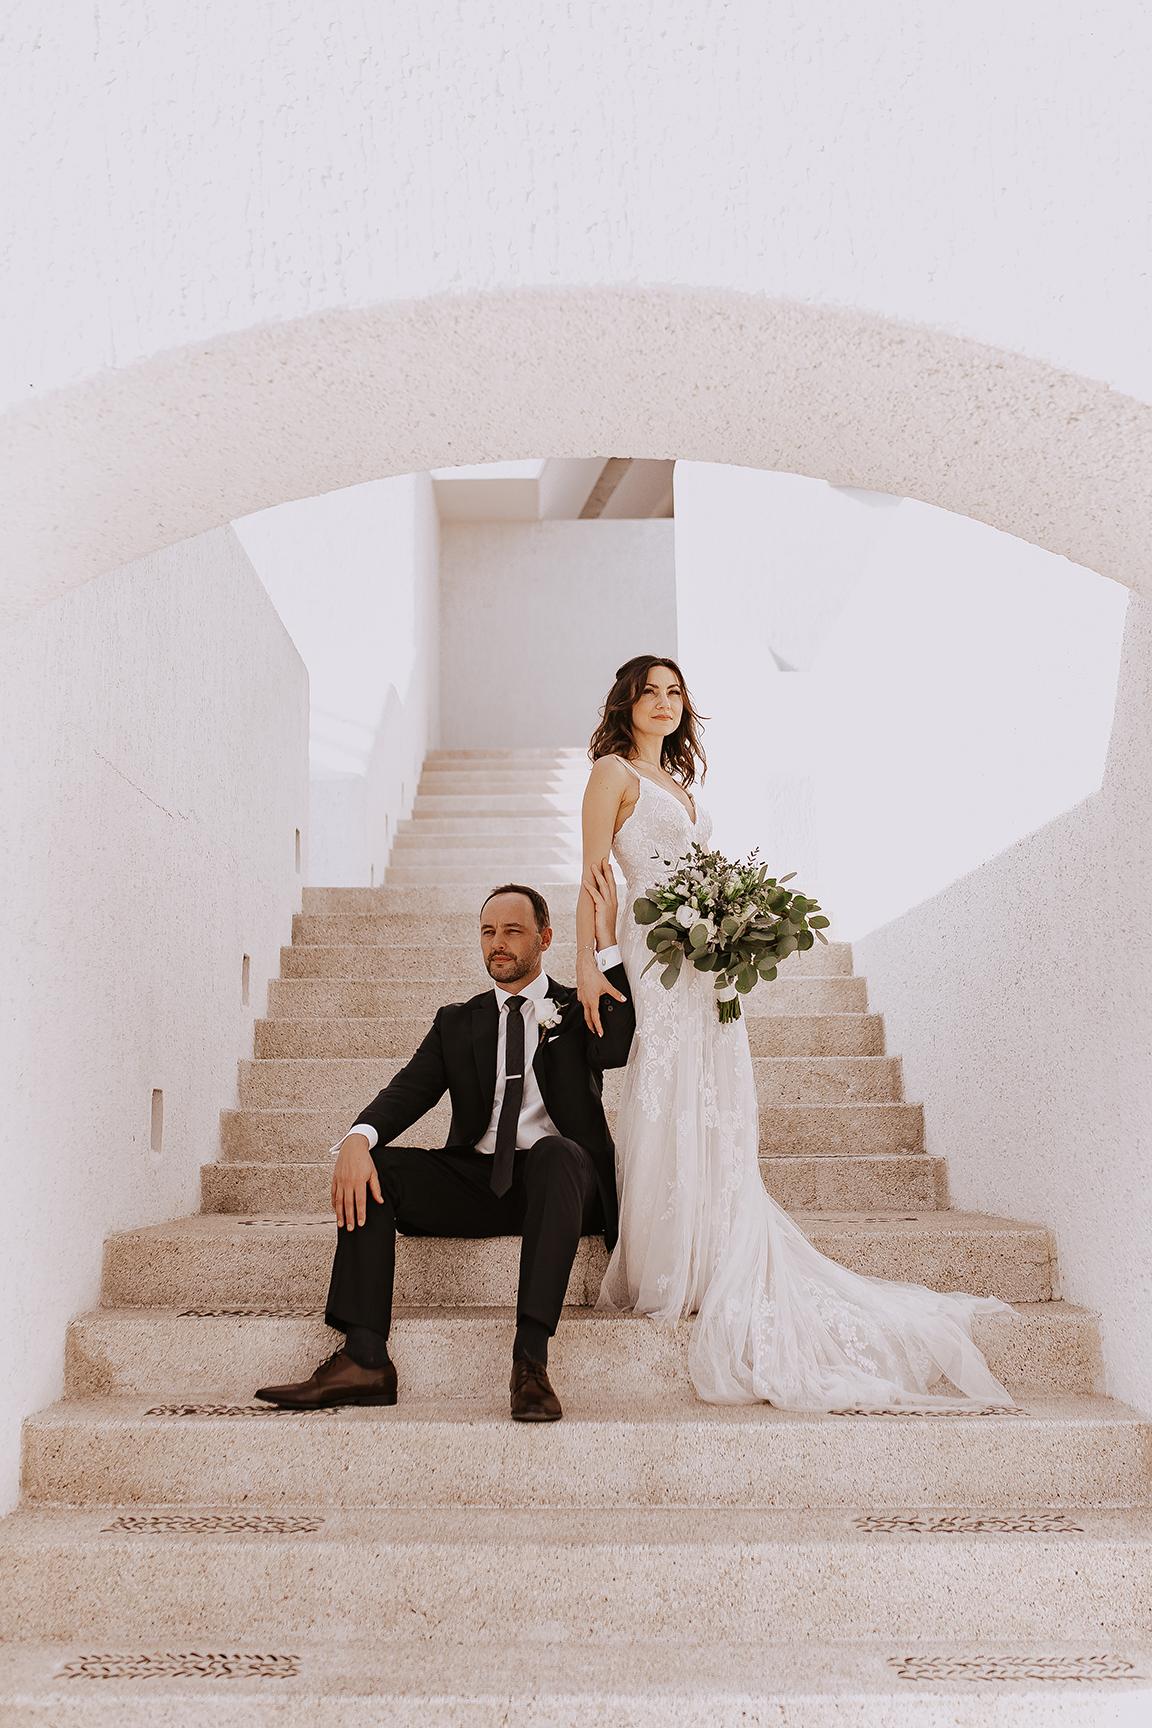 Lindsei+James_cabo_wedding_341.jpg